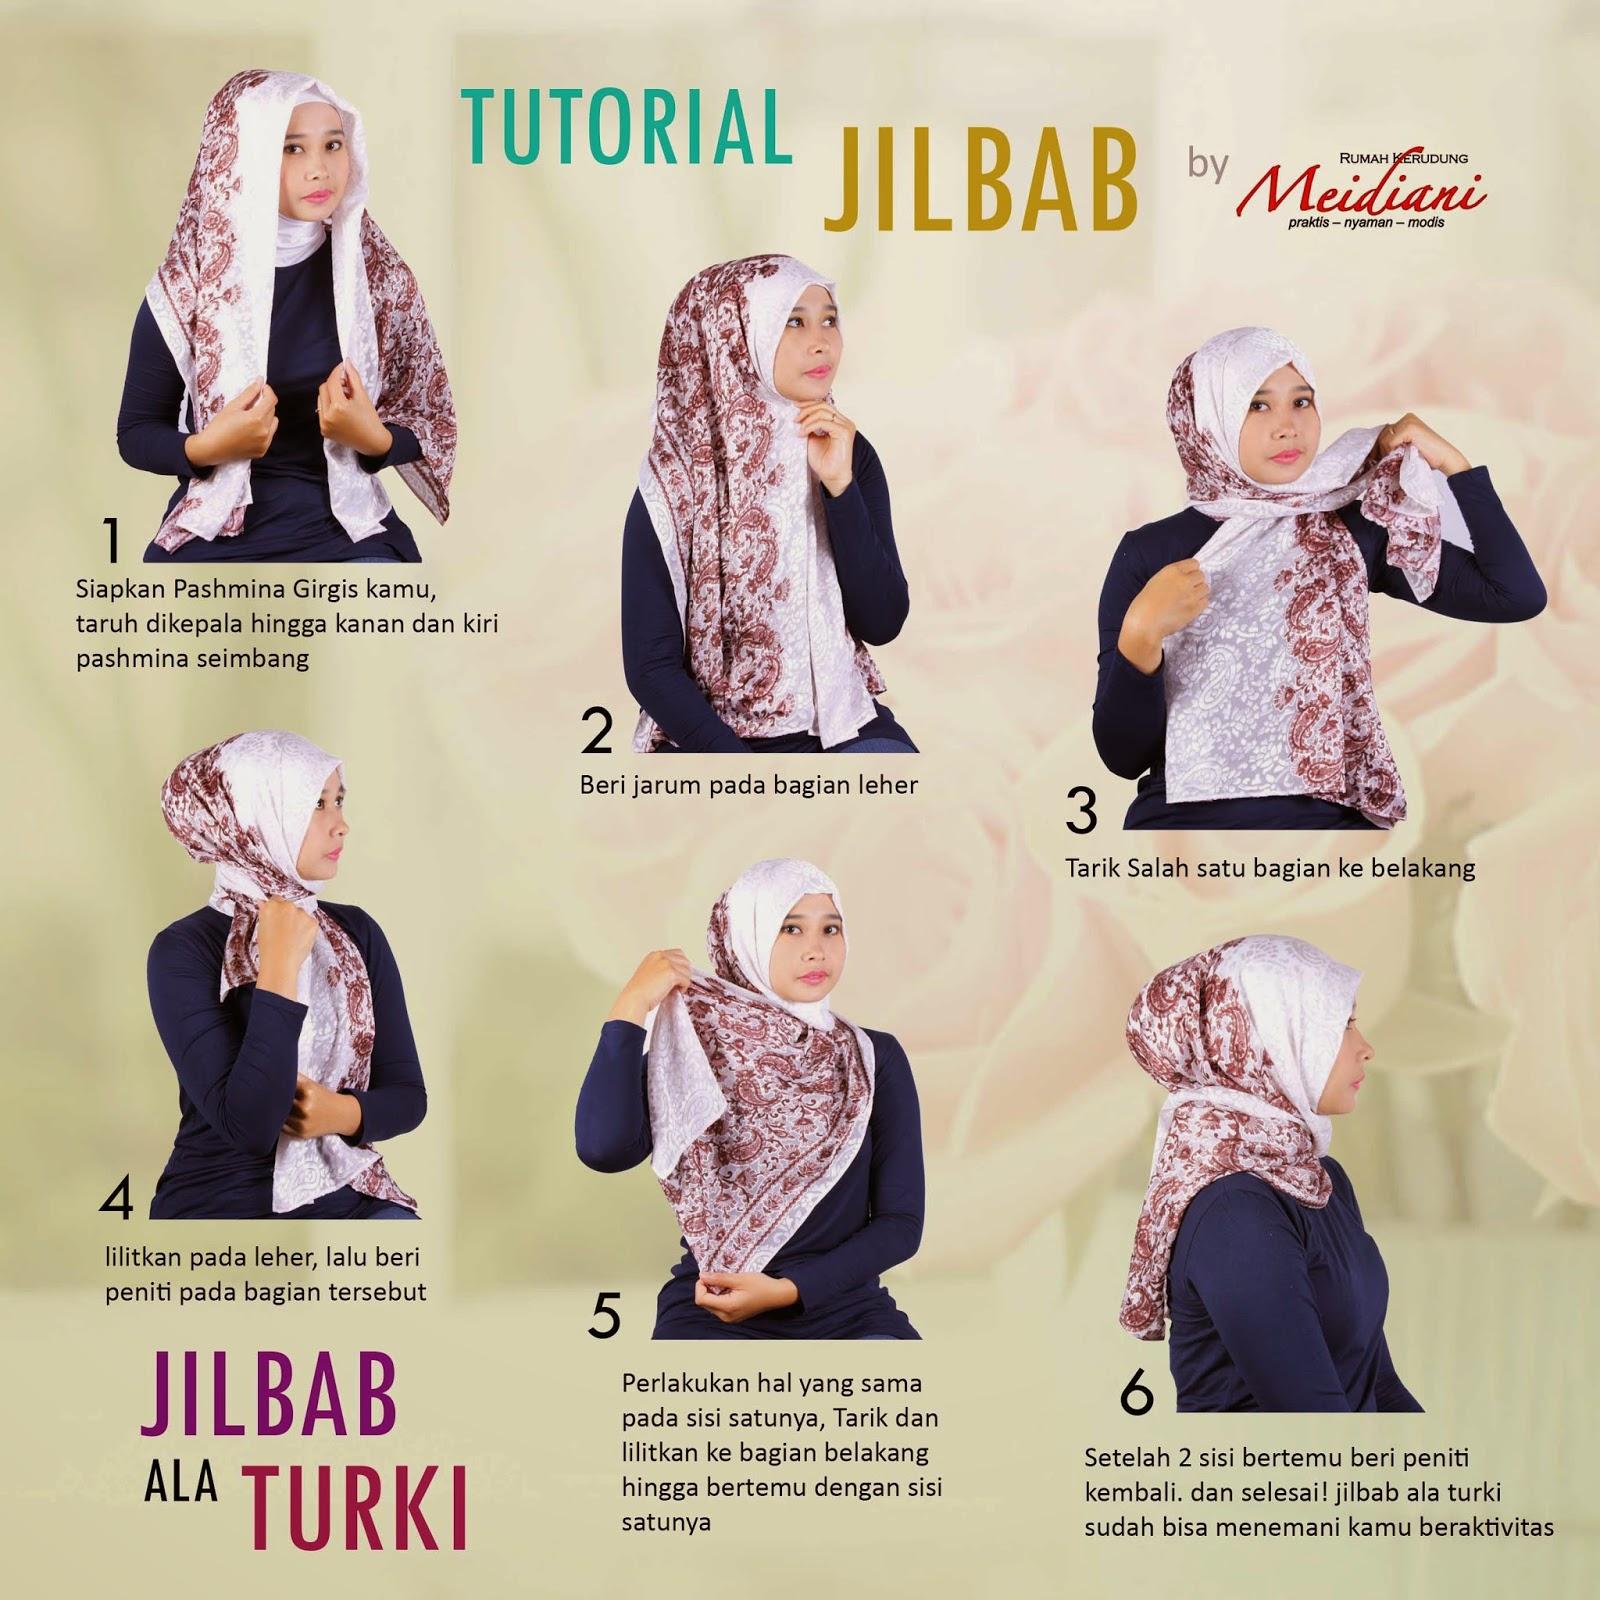 Tutorial Memakai Jilbab Ala Turki